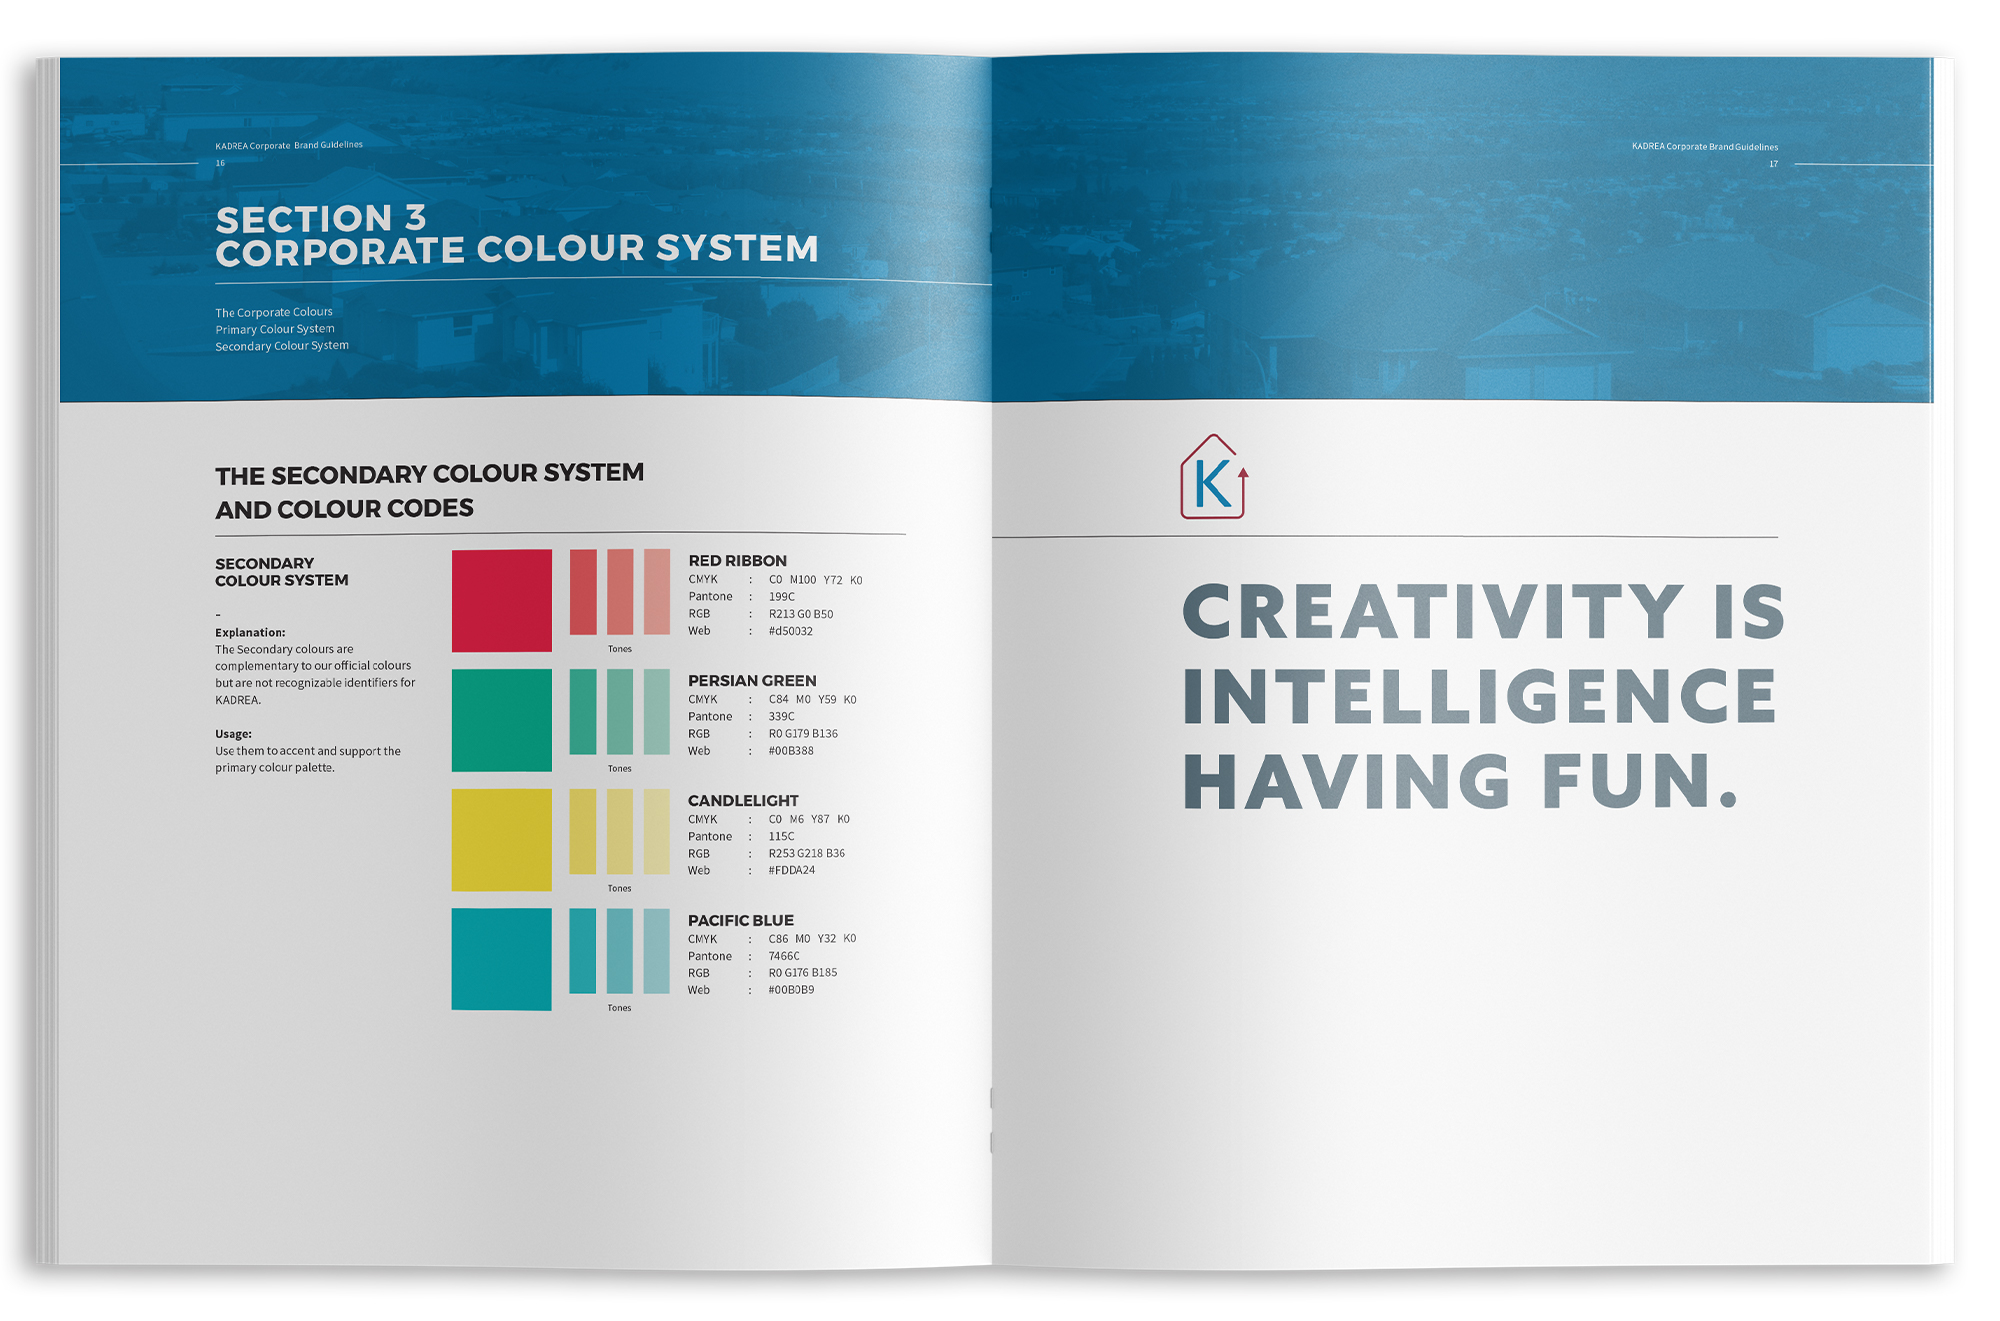 Inside spread of KADREA's brand guidelines showing colour pallett.